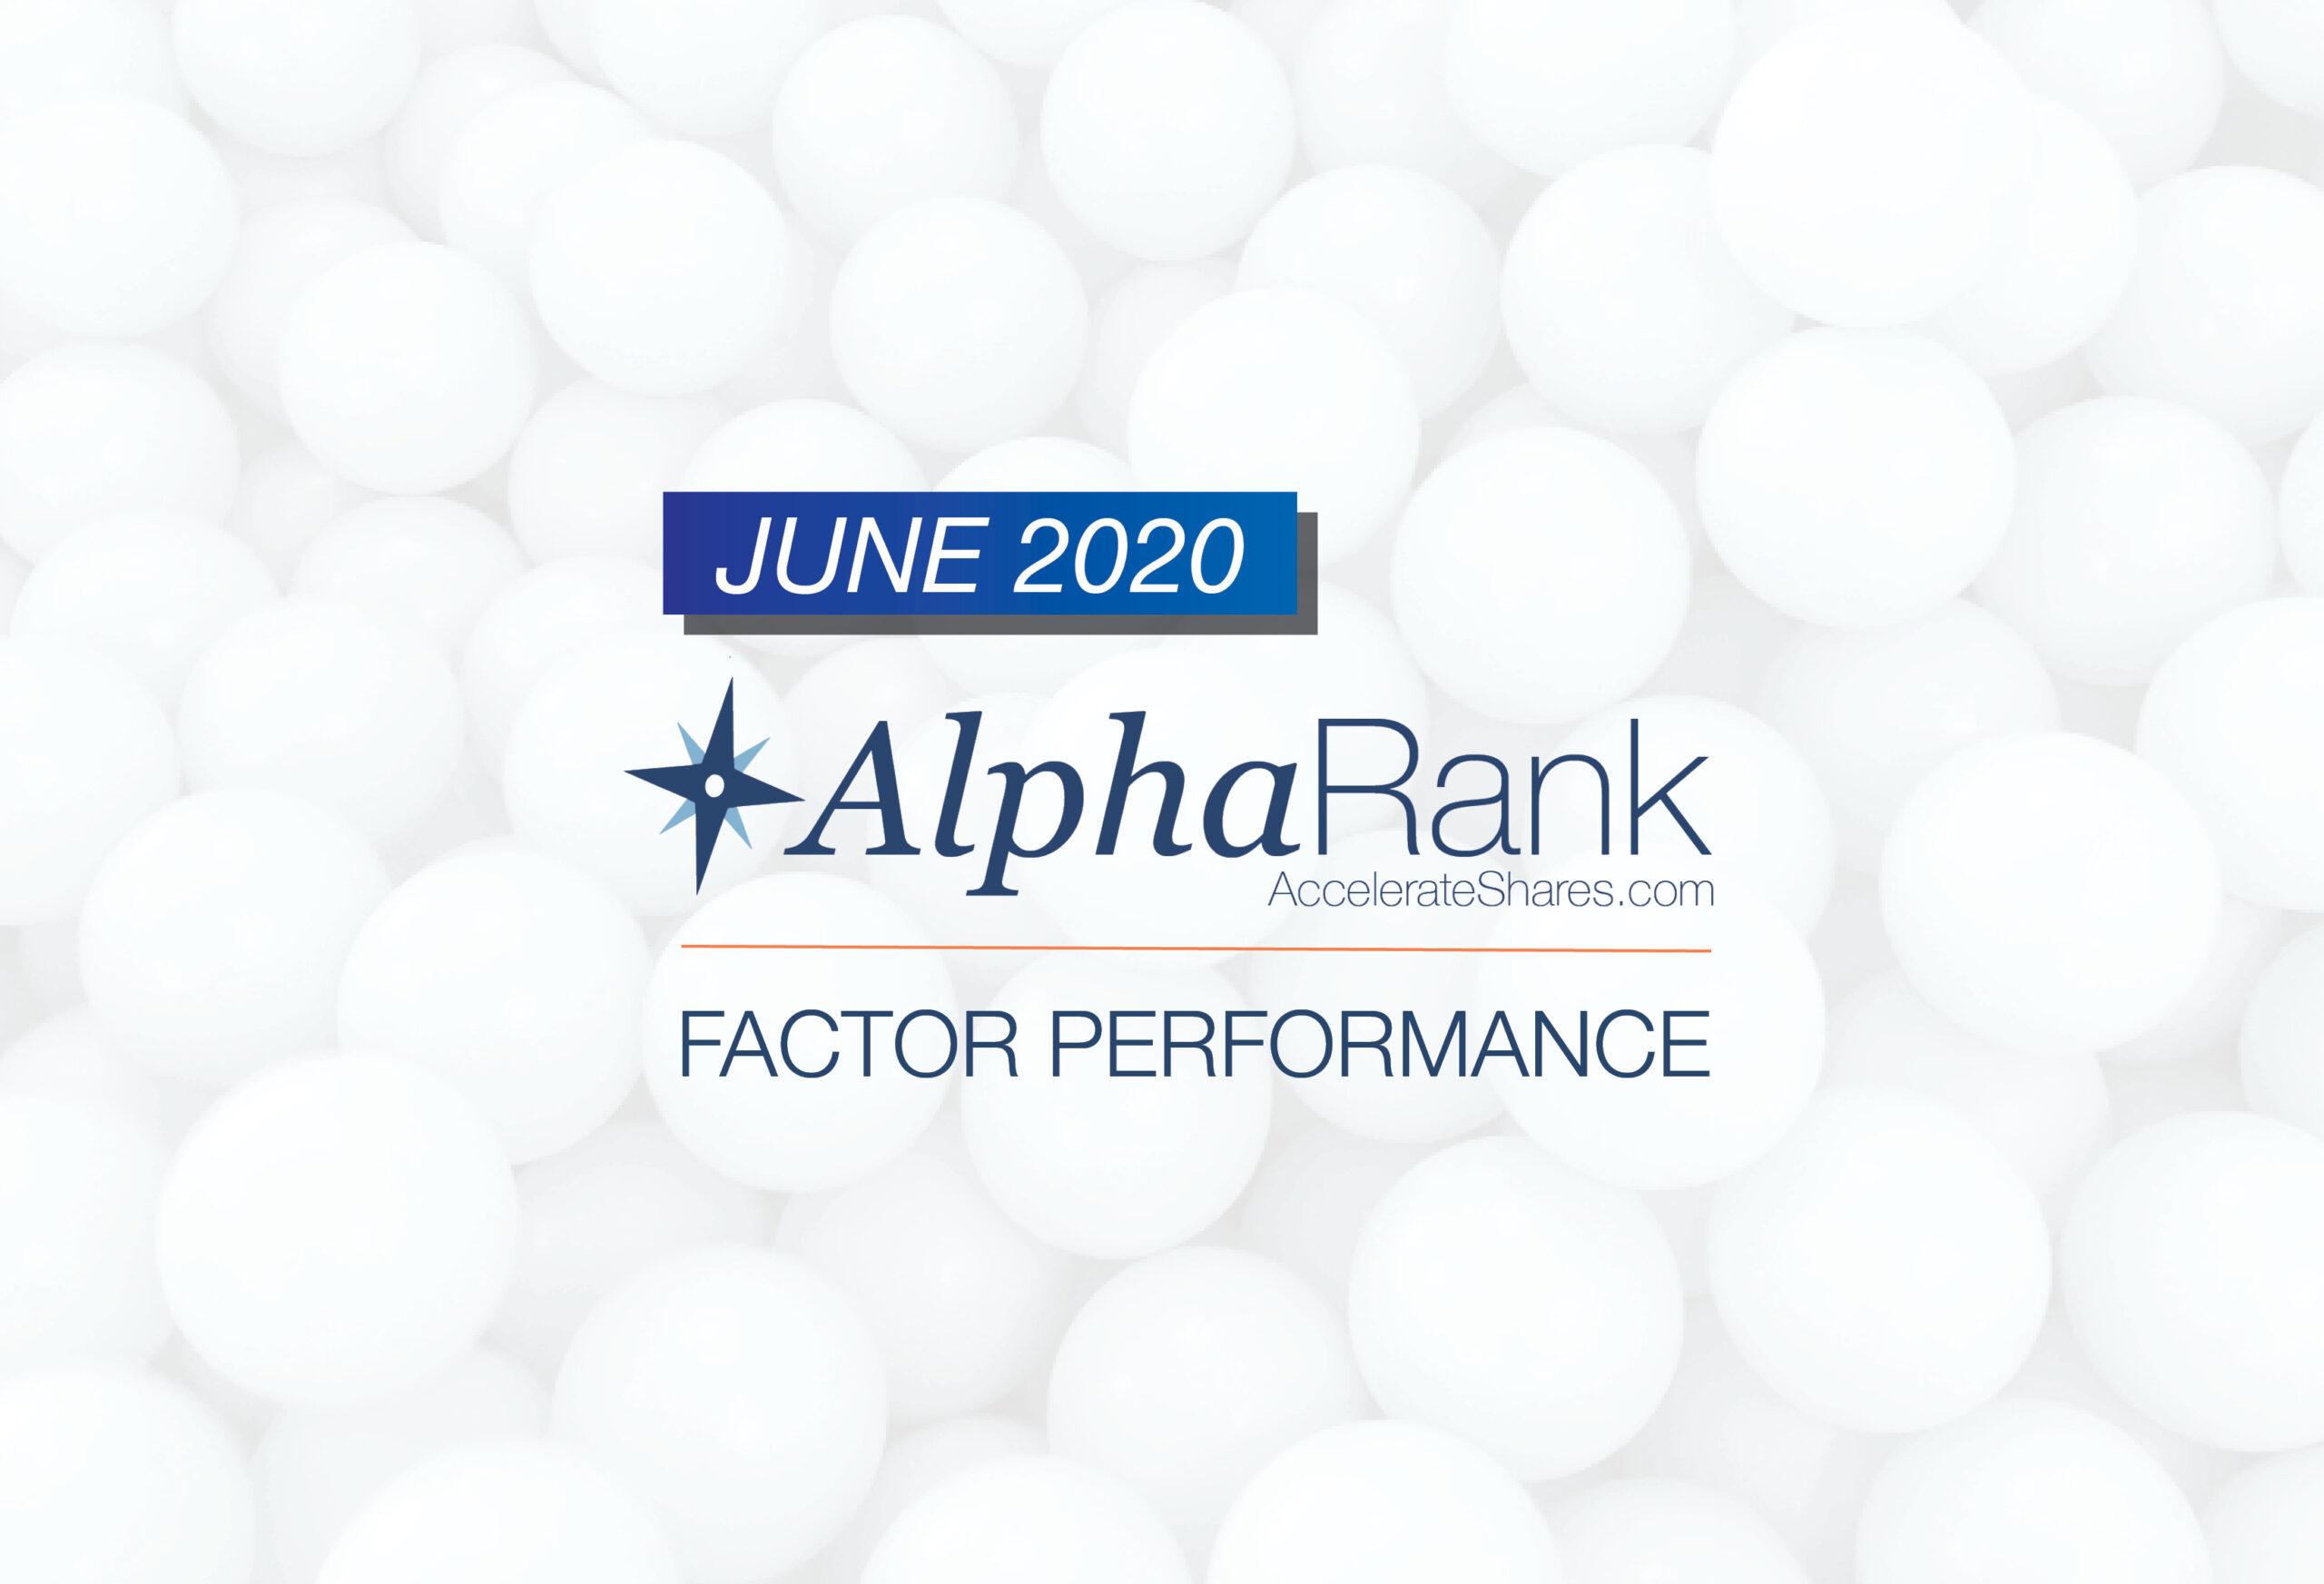 AlphaRank Factor Performance— June 2020